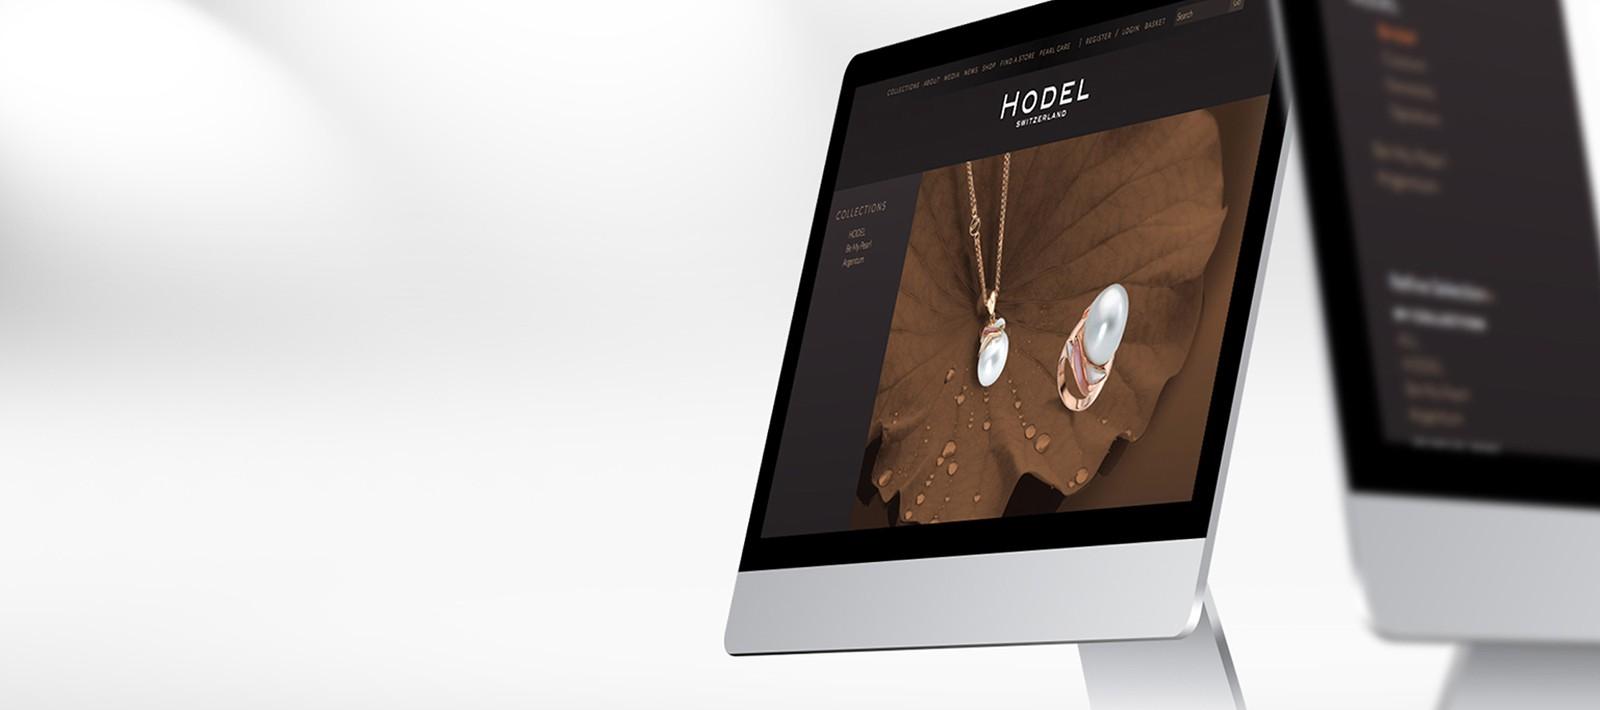 Hodel-jewellery-web-development-2